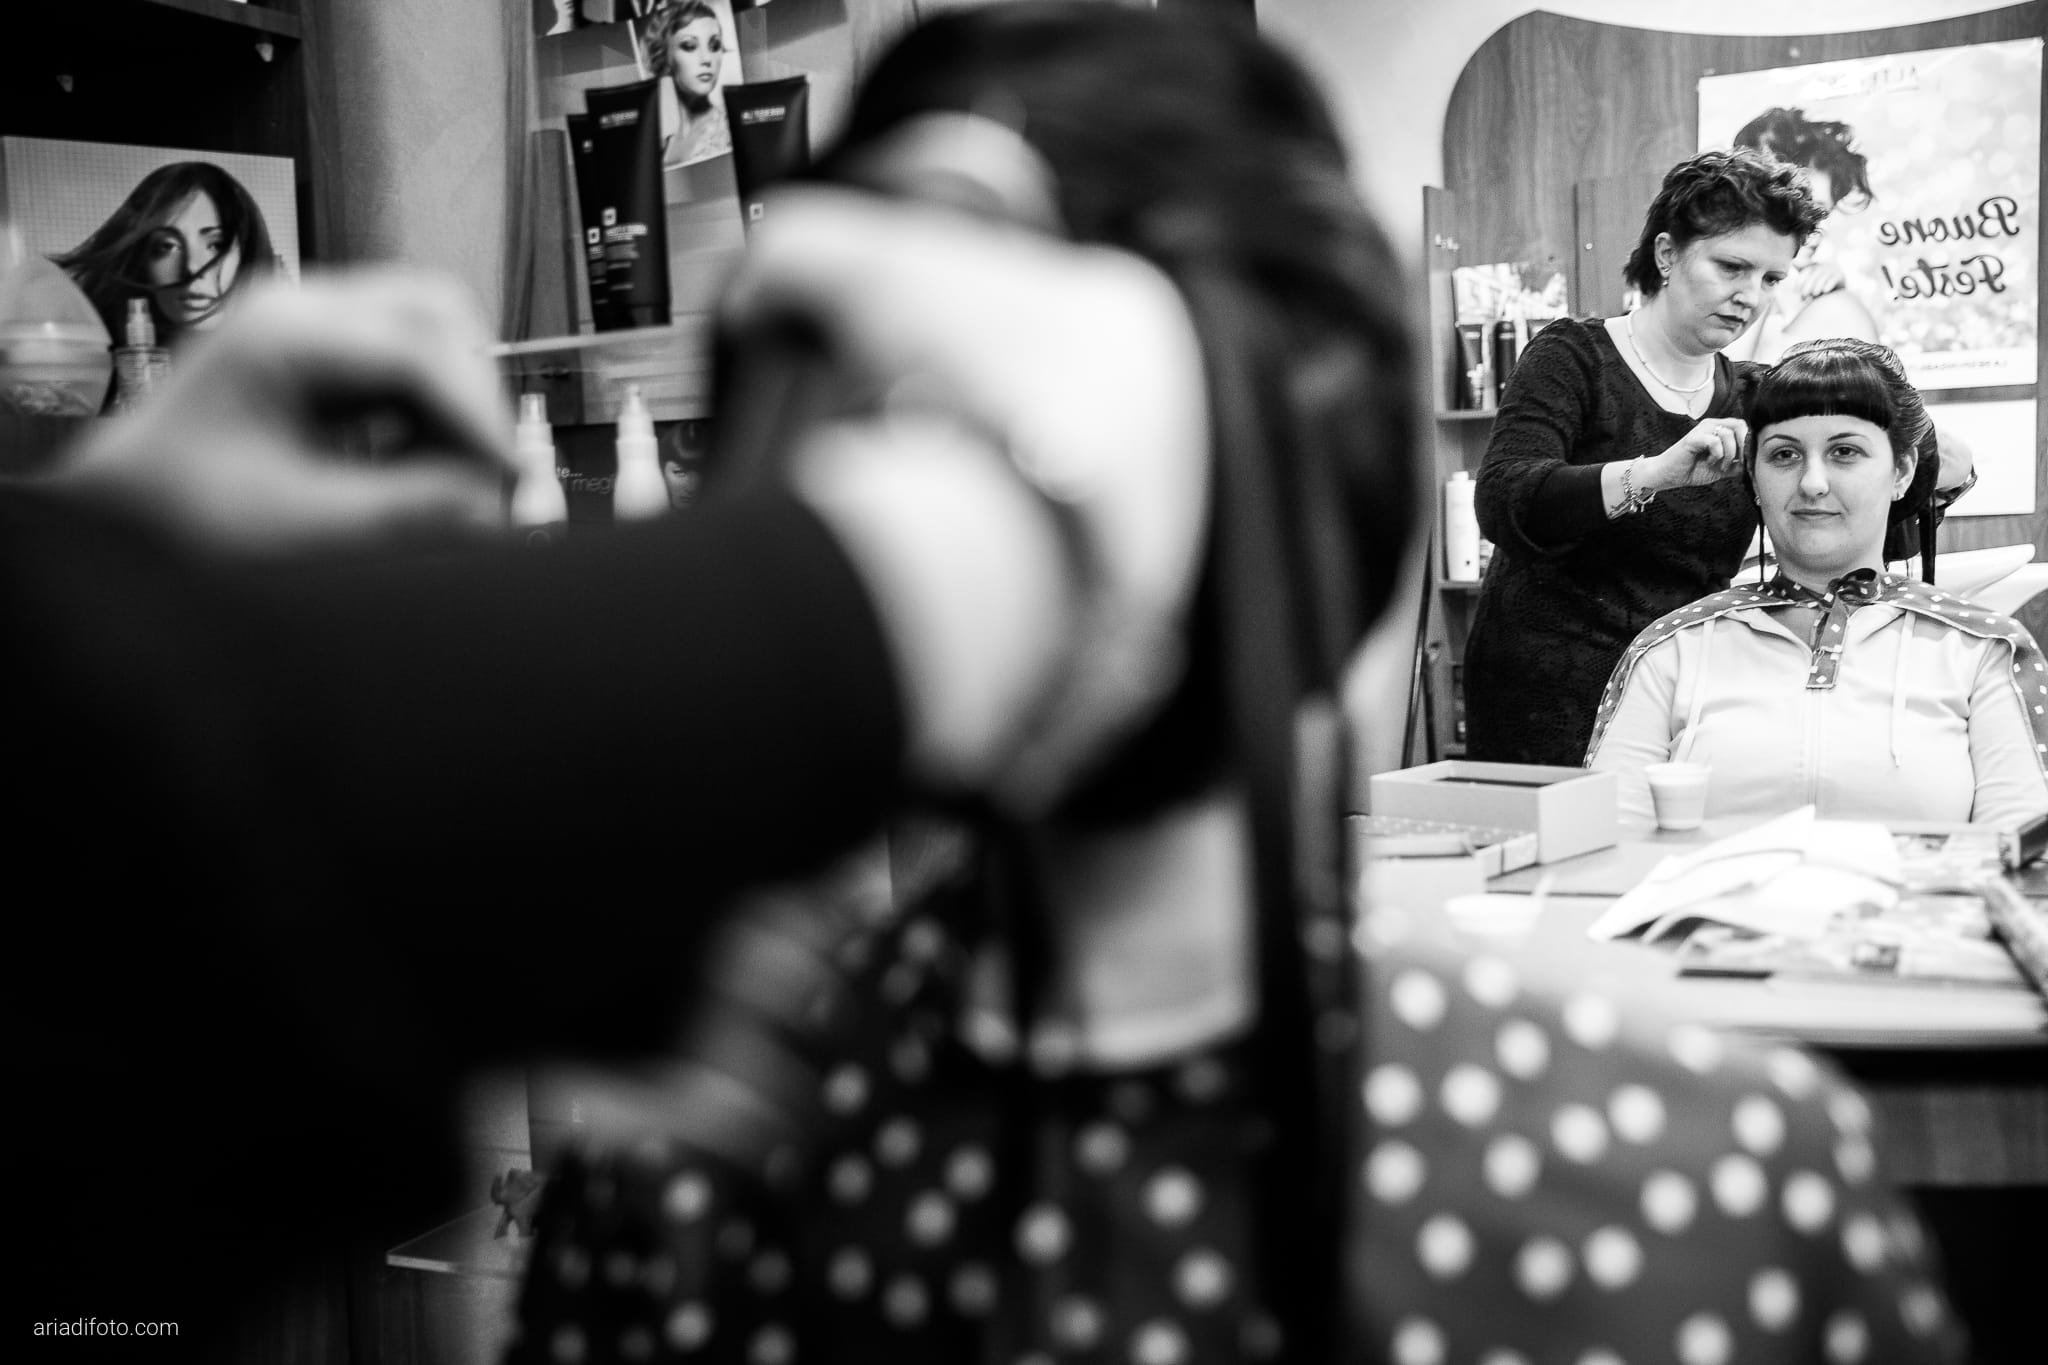 Agnese Alessandro Matrimonio Centro Visite Gradina Doberdo Gorizia Farra preparativi acconciatura specchio riflesso